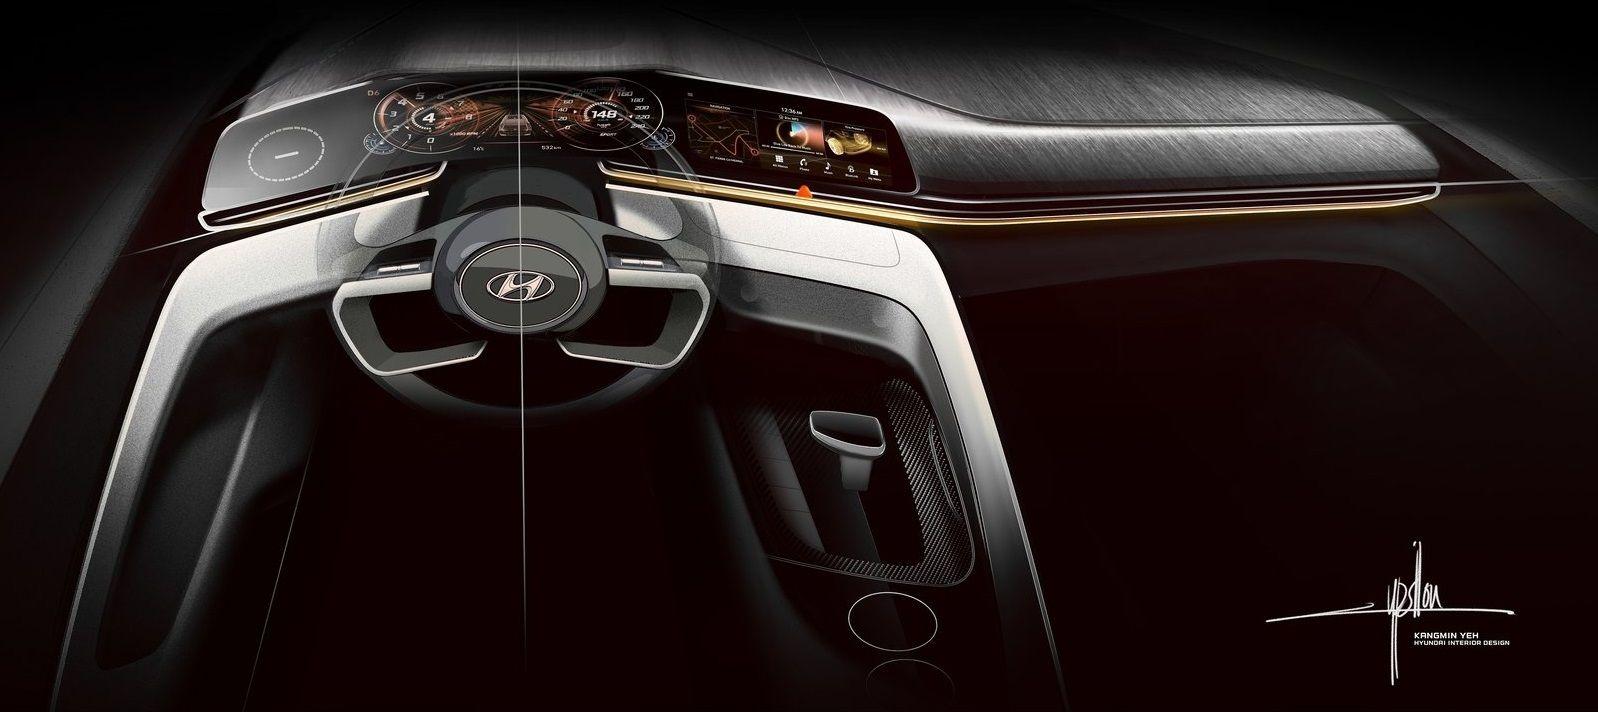 2020 Hyundai Elantra In 2020 Hyundai Elantra Elantra Car Design